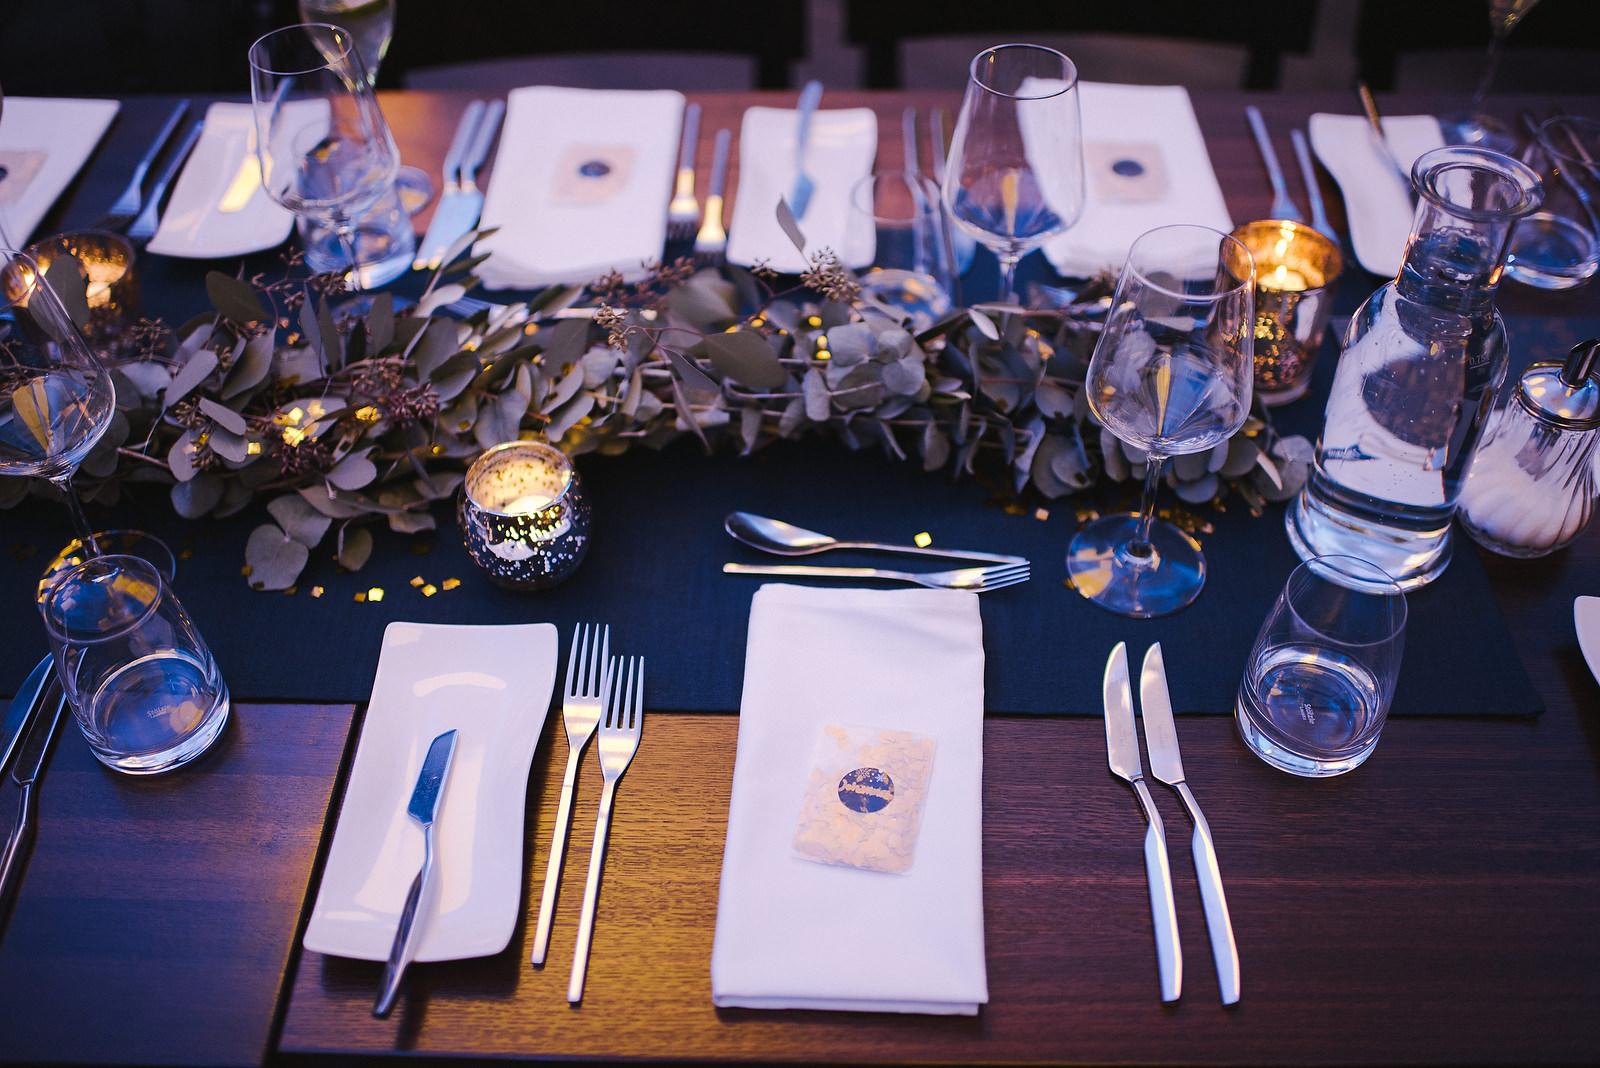 Fotograf Konstanz - Silvester Wedding in Hagnau / Friedrichshafen at Lake of Constance  - 38 -